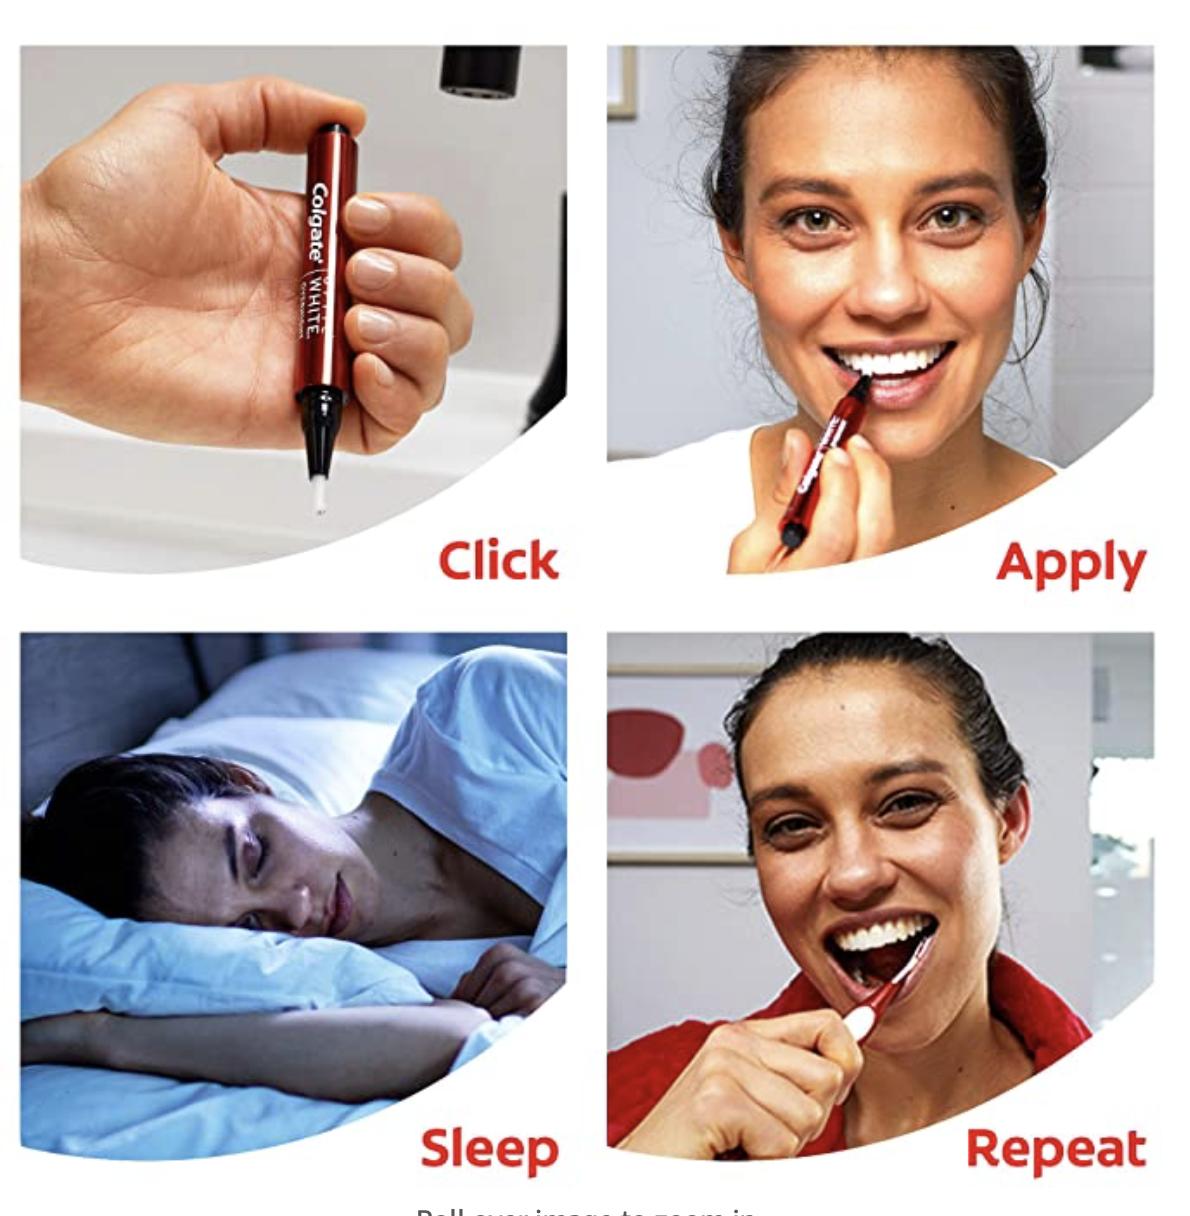 Colgate teeth whitening pen